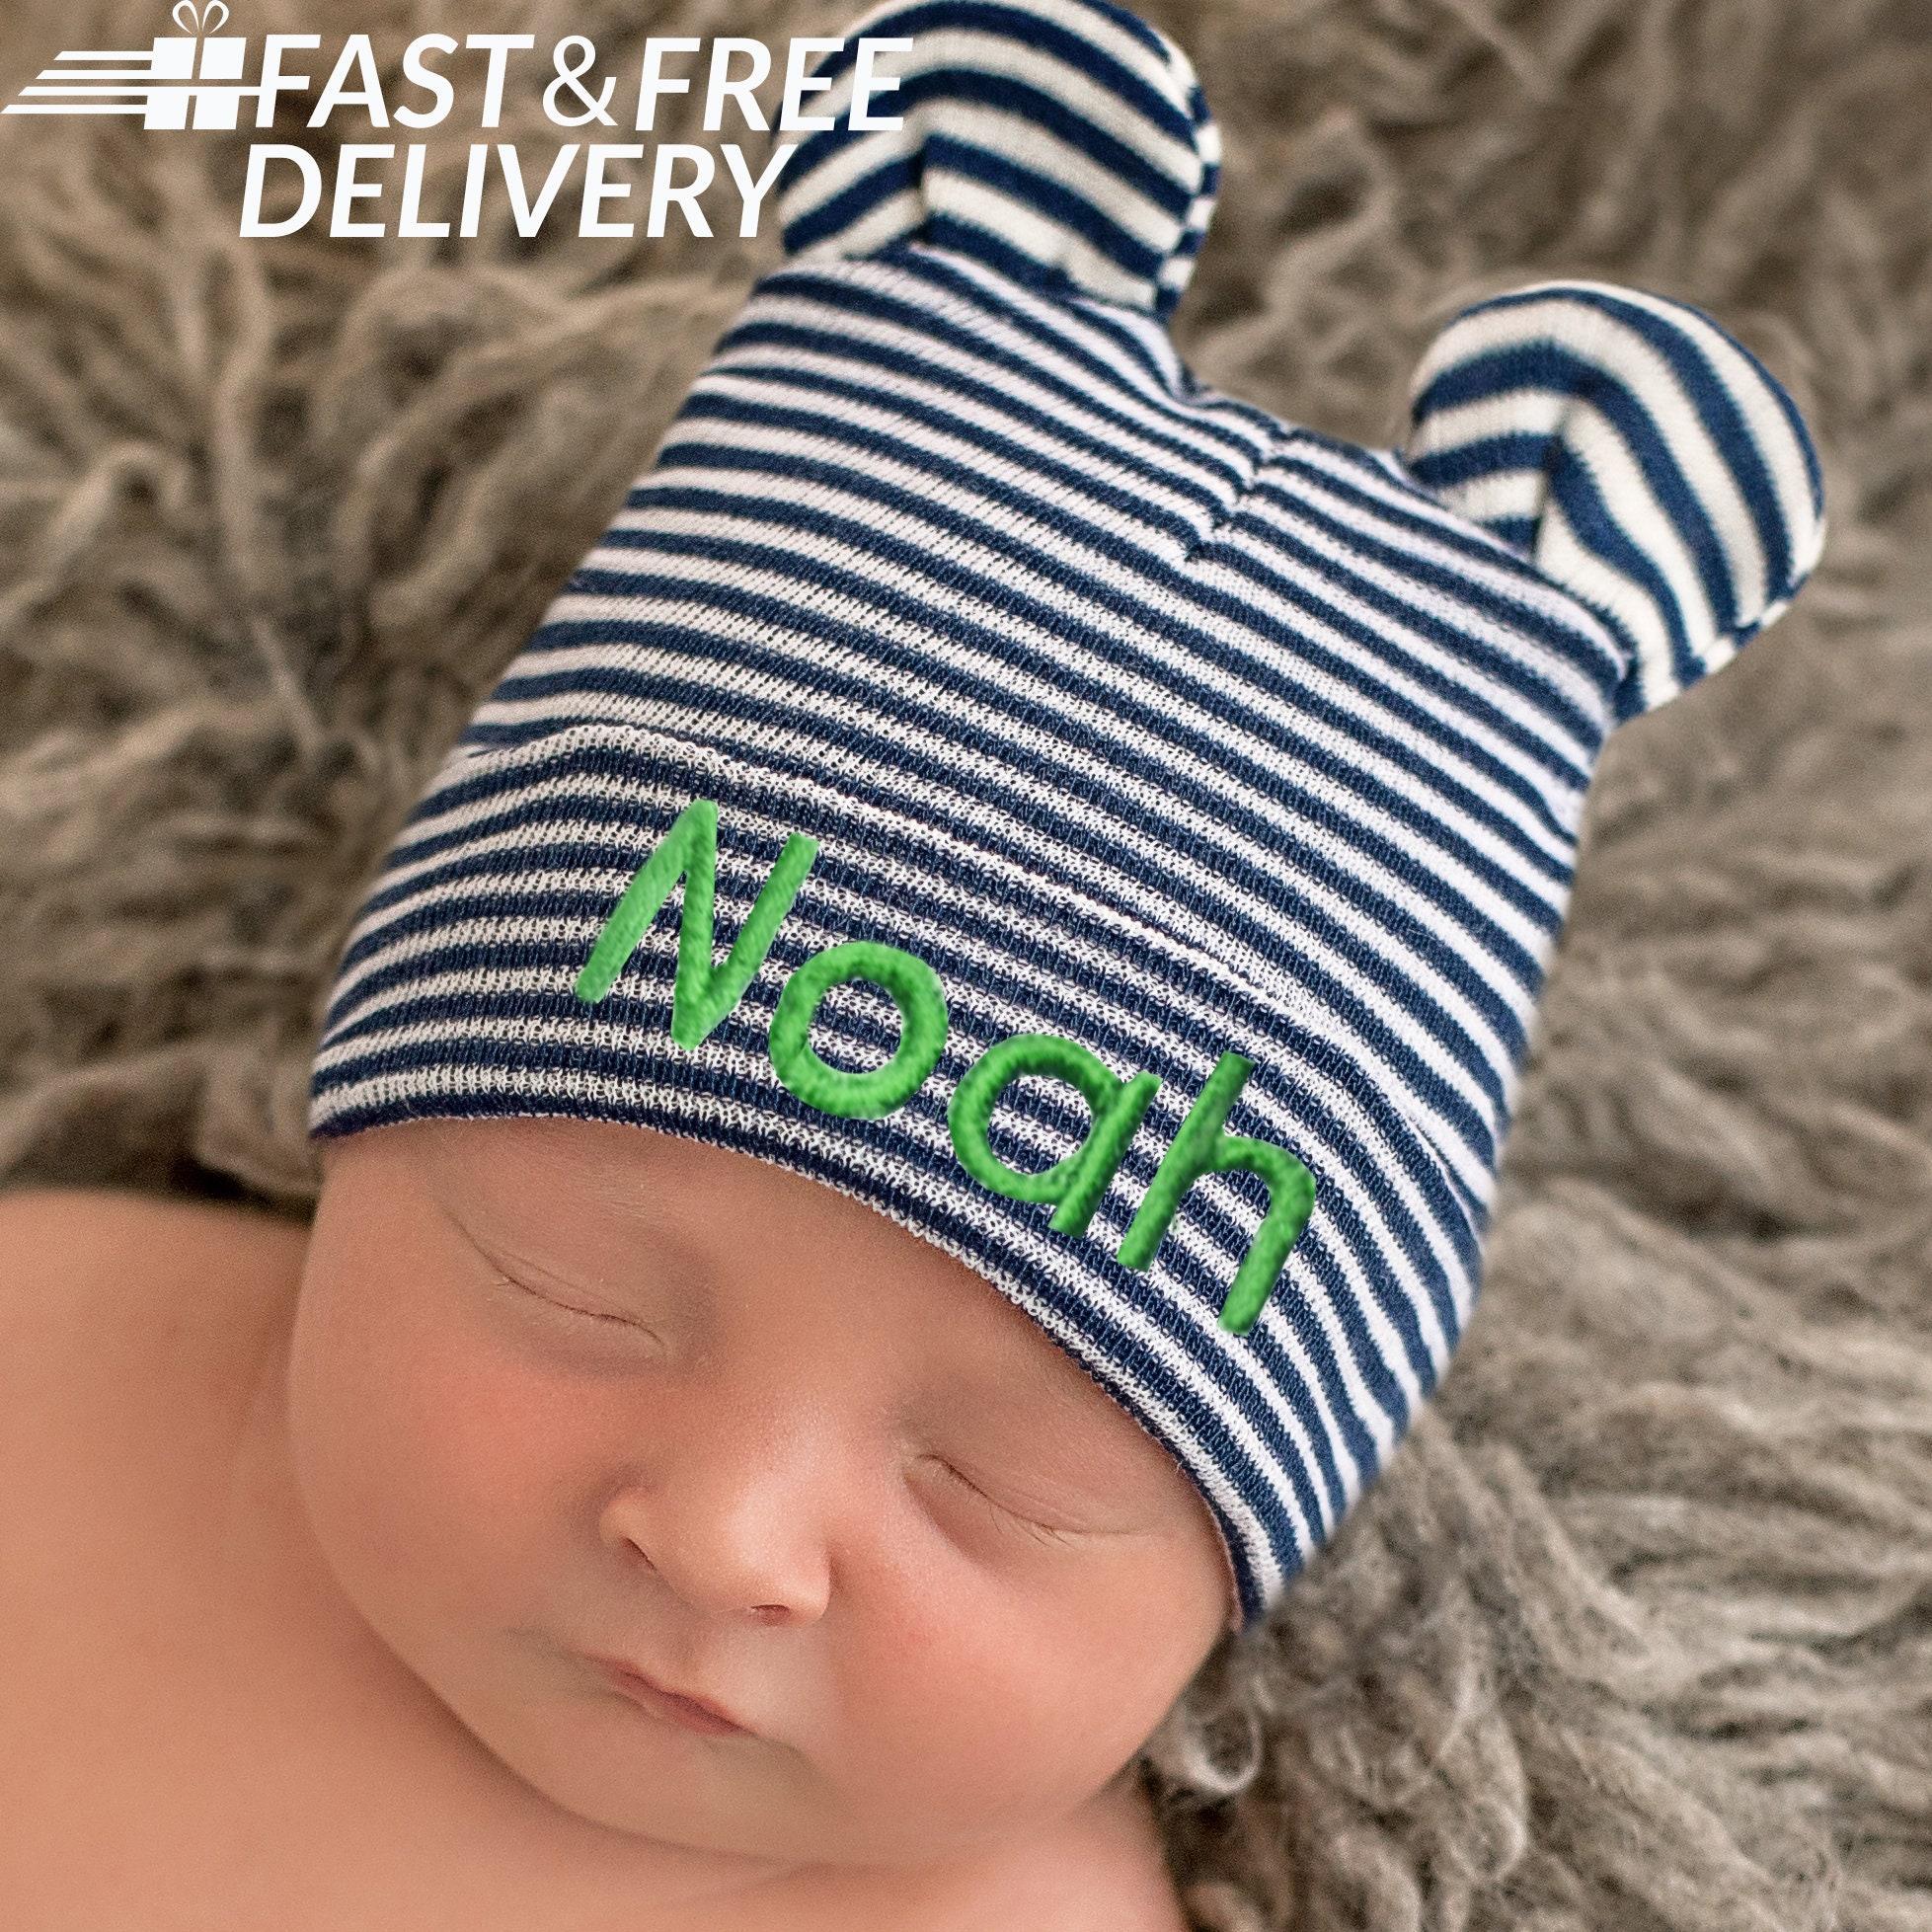 40db97d24 Melondipity Newborn Boy Hospital Hat - Baby Bear Hat - Striped Hospital Hat  - Baby Bear Striped Hat - Navy Blue and White Stripes Newborn